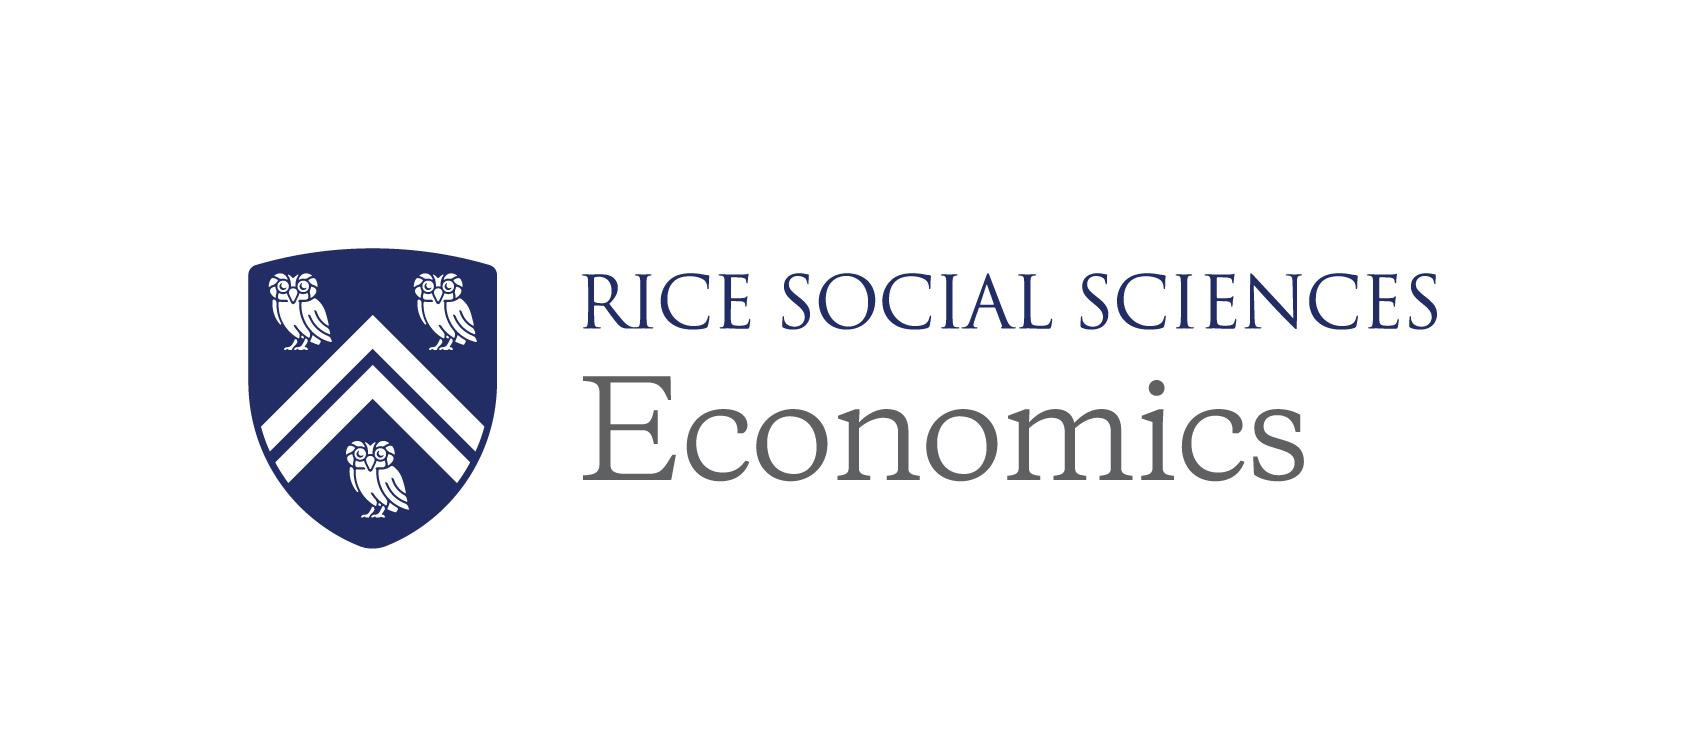 Rice University School of Social Science Department of Economics